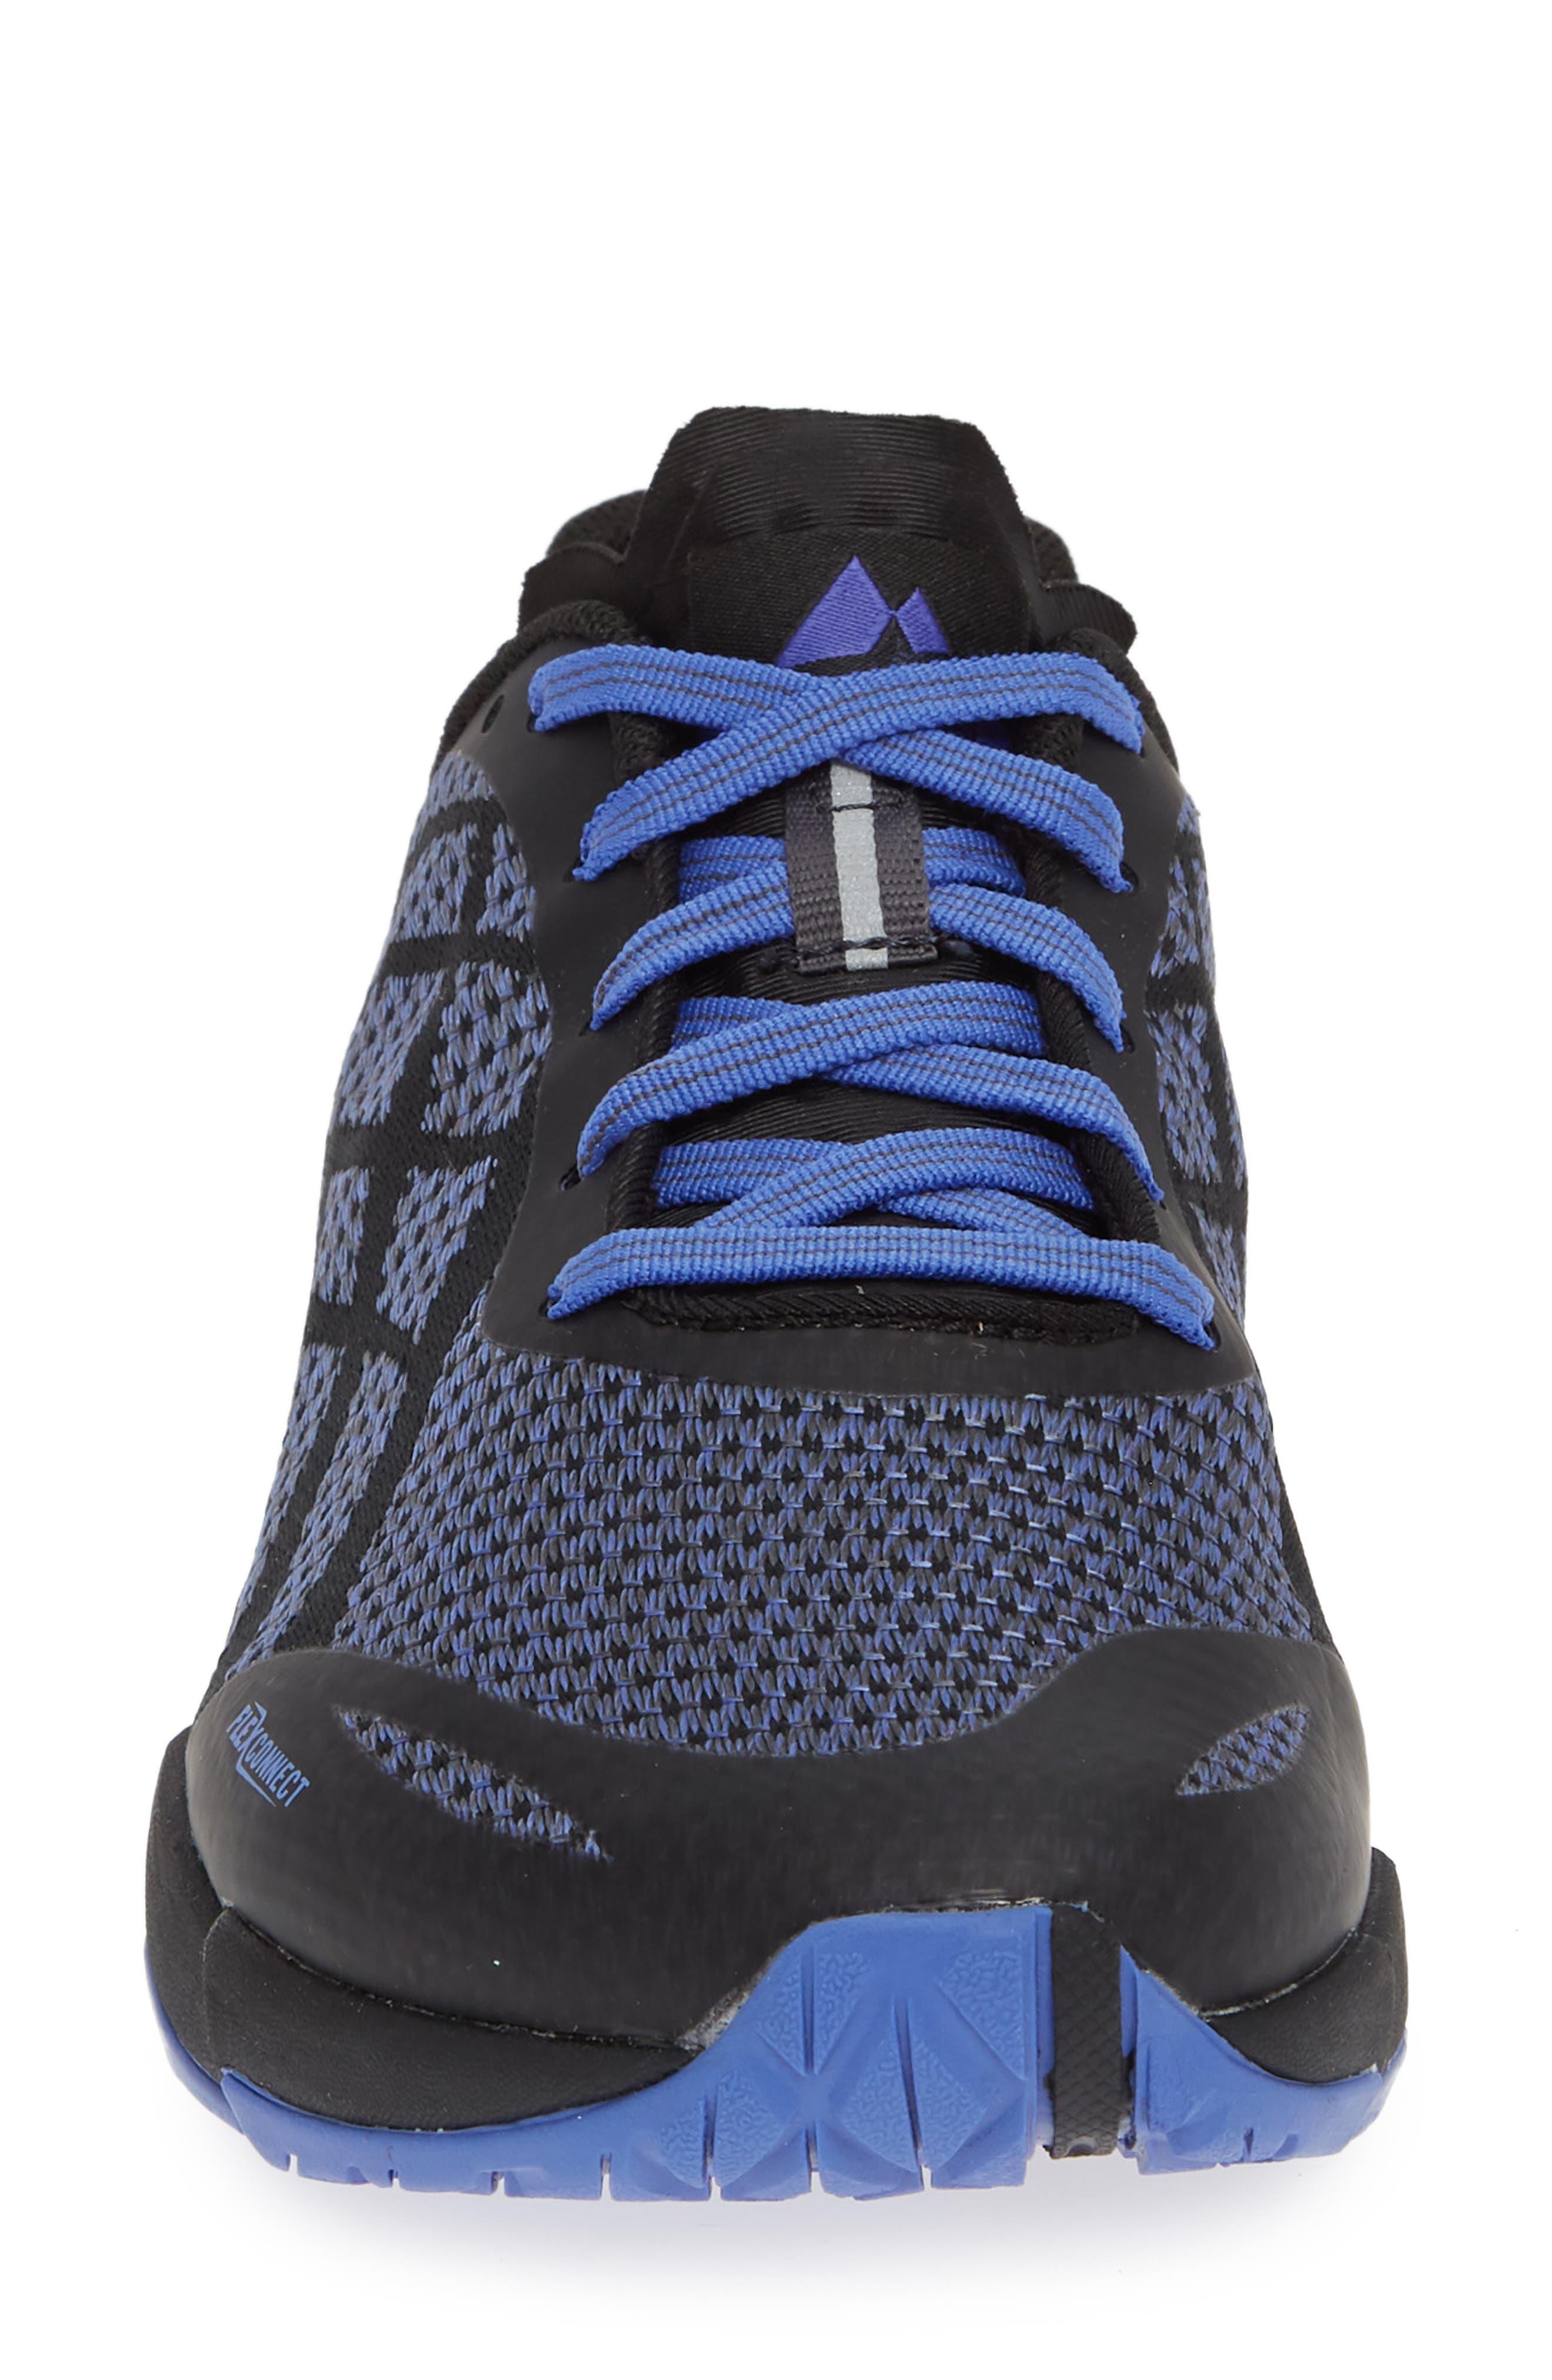 MERRELL, Bare Access Flex Shield Lace-Up Sneaker, Alternate thumbnail 4, color, 001